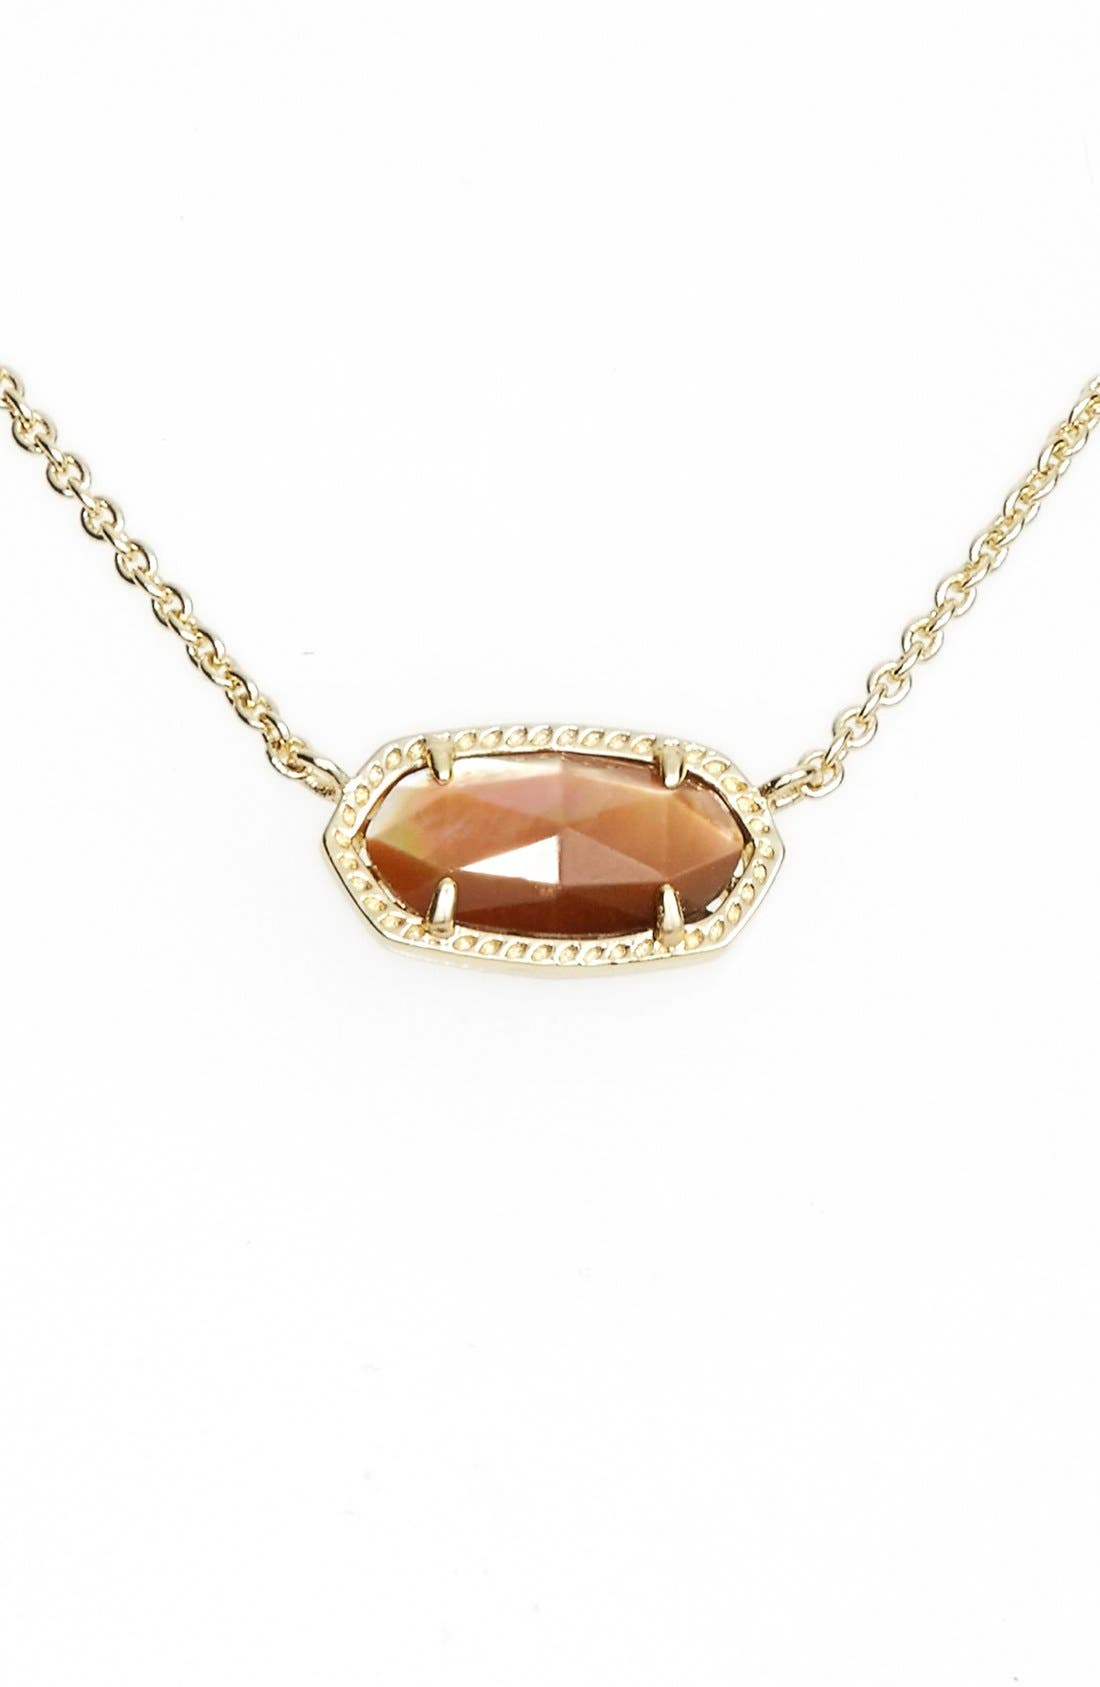 Main Image - Kendra Scott 'Elisa' Pendant Necklace